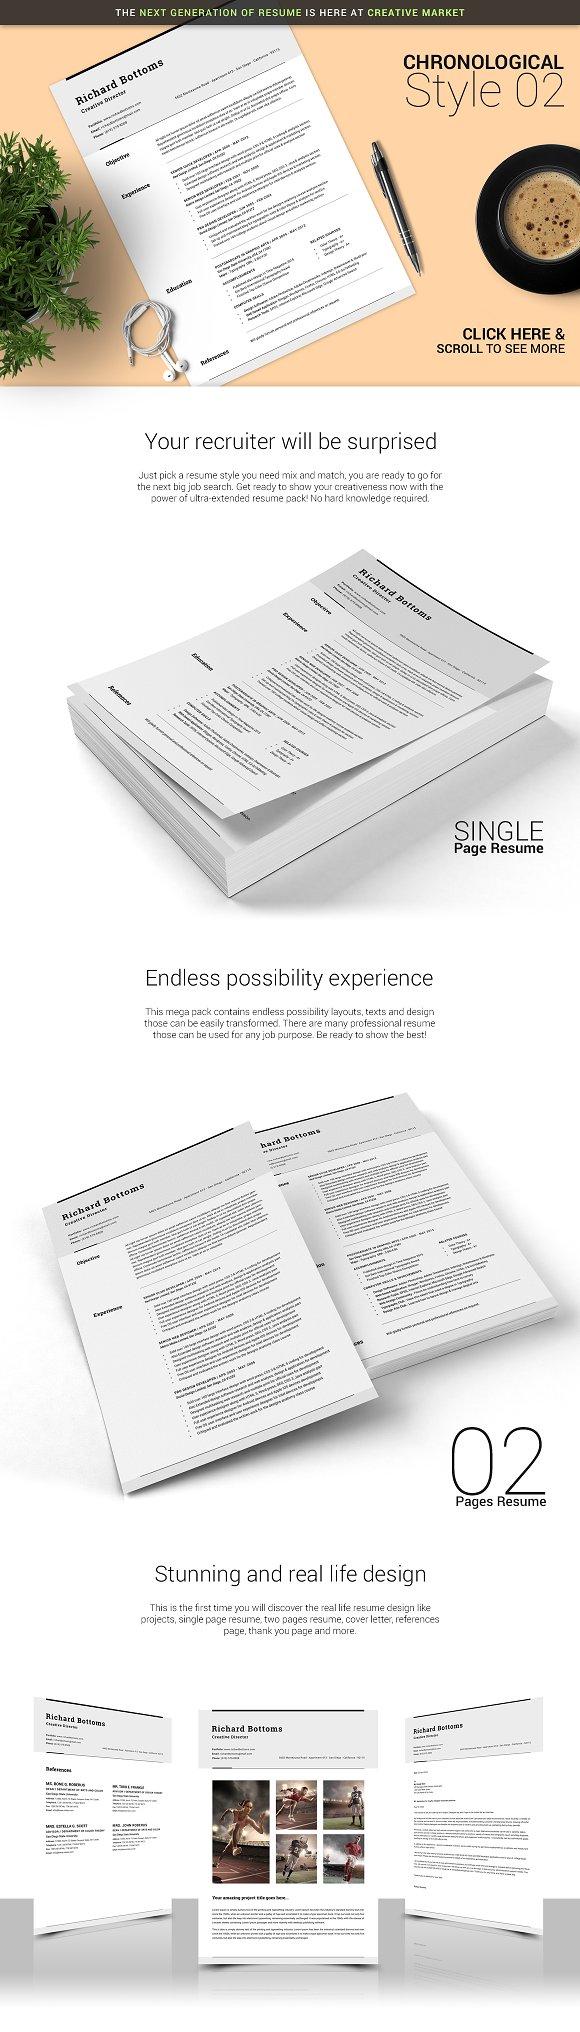 Timeless Resume Ultra Extended Pack Resume Templates Creative Market